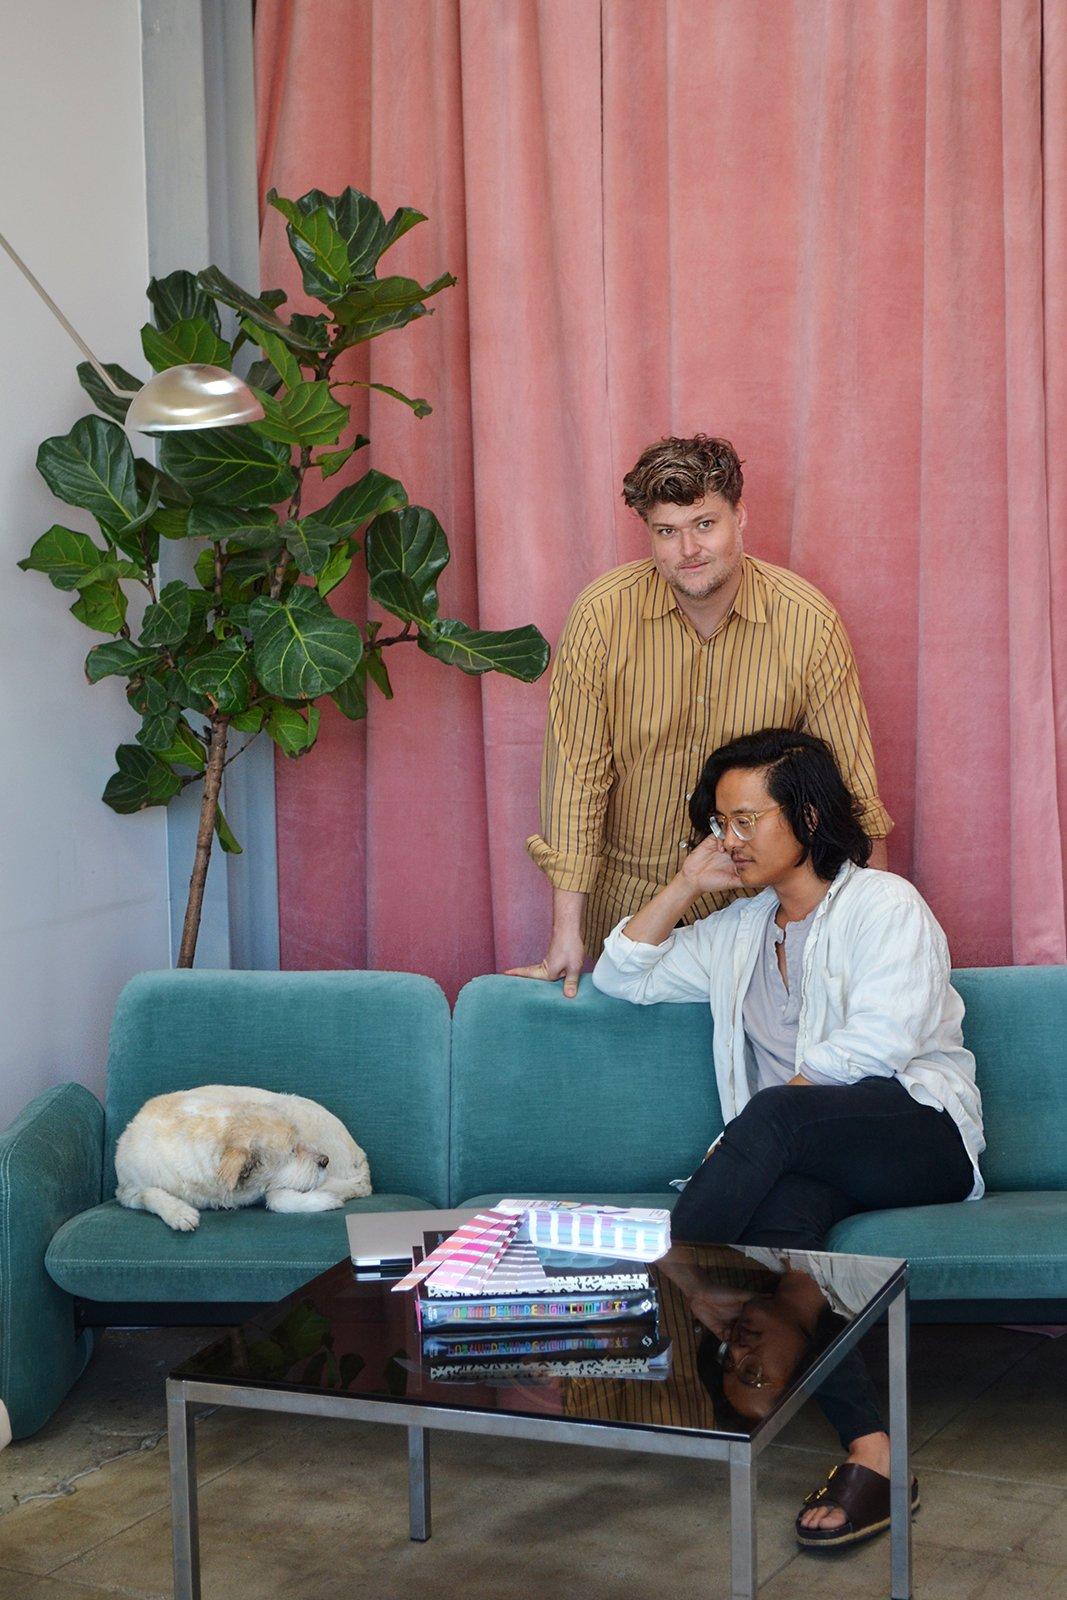 for Antidote - Studio Visit: Boy Smells